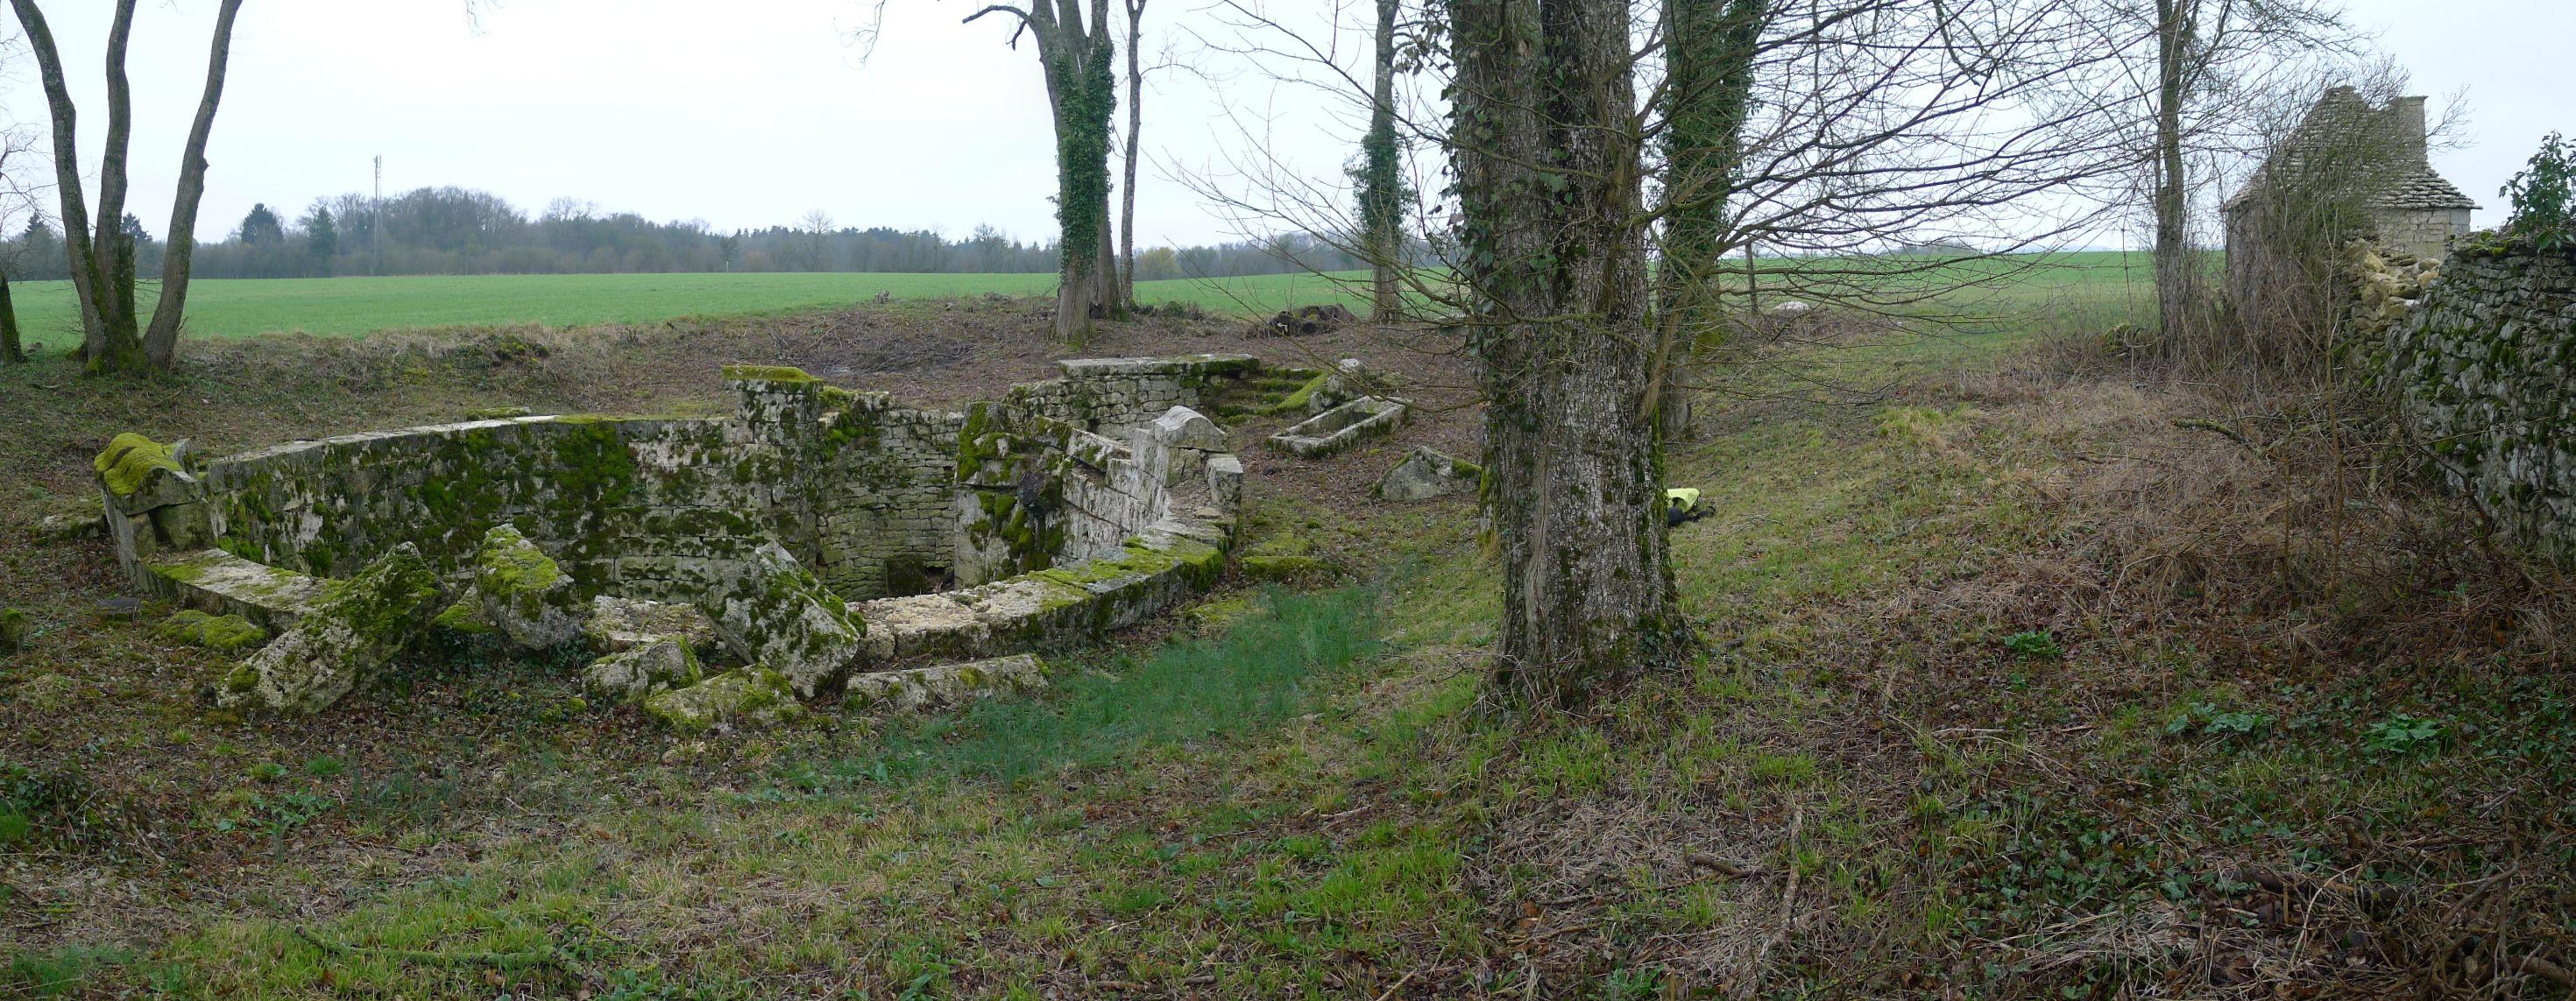 site de la fosse